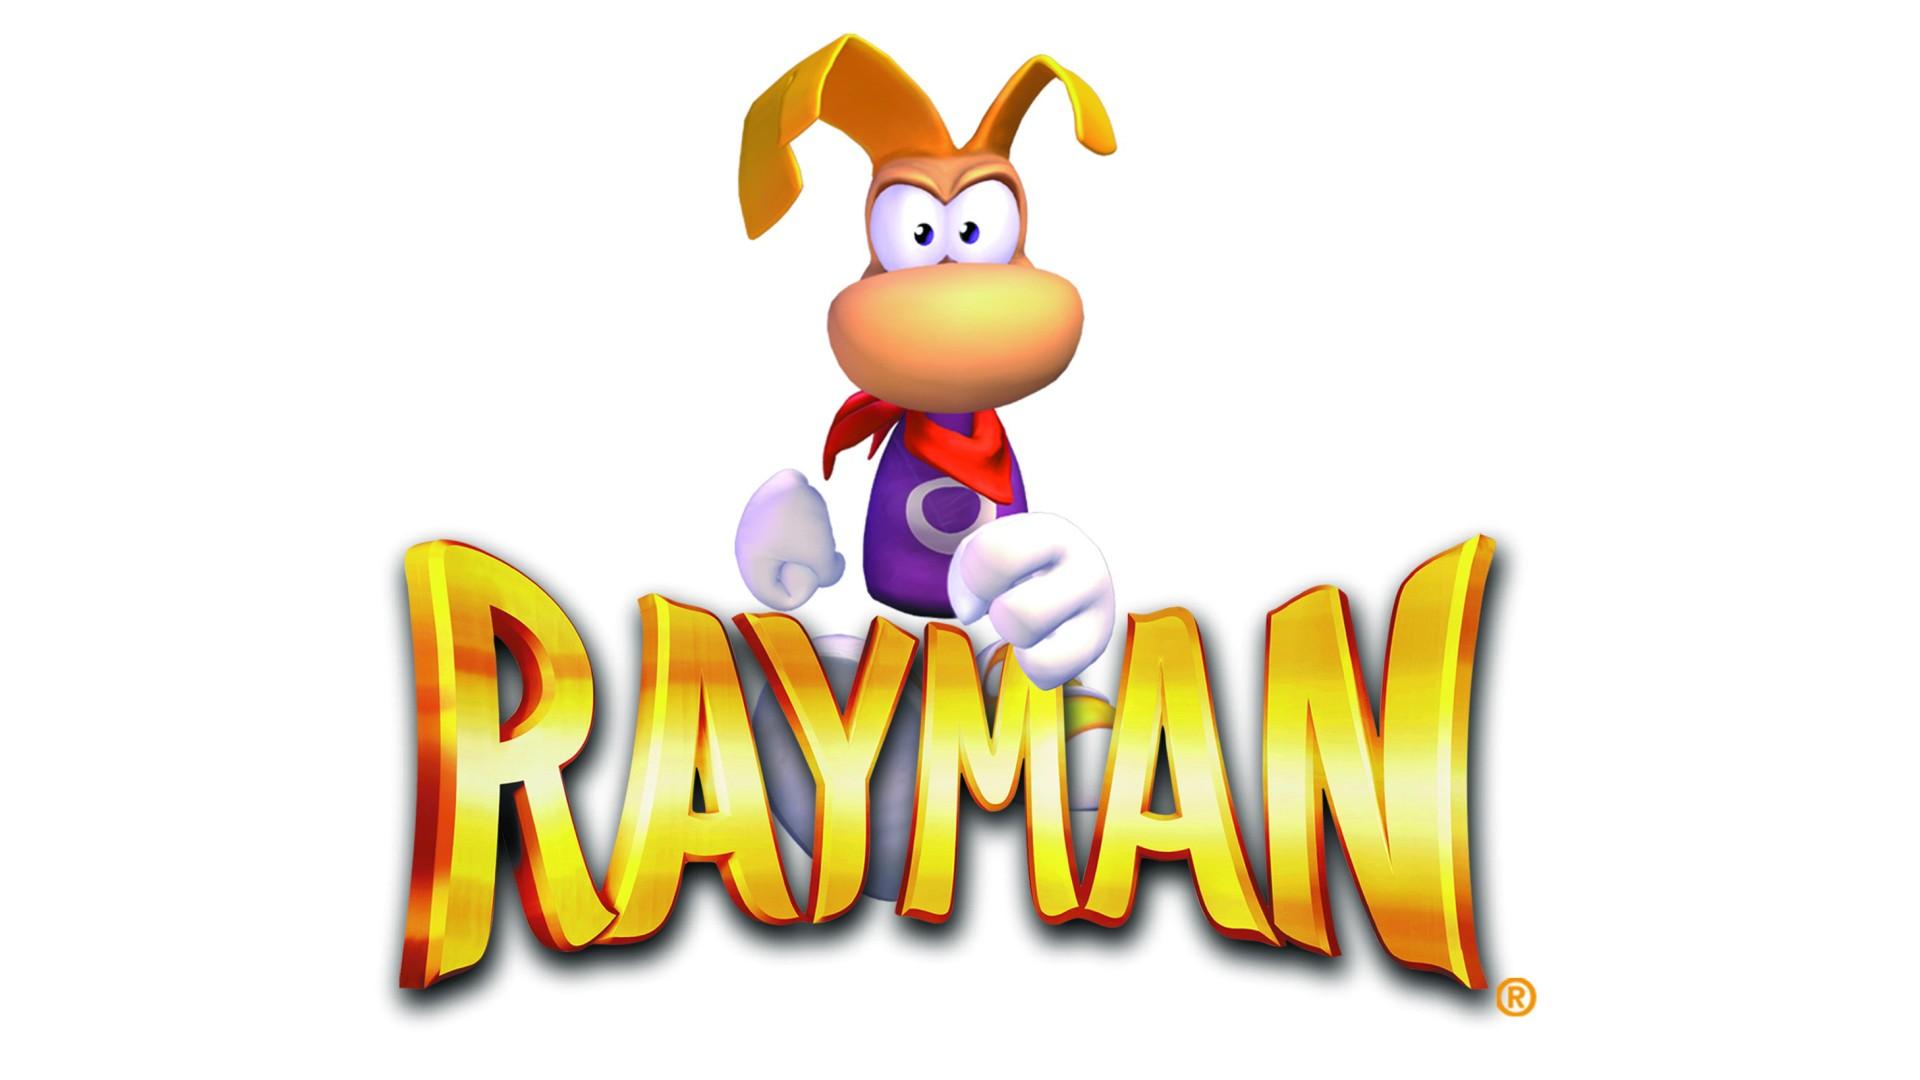 Video Game Rayman 1920x1080